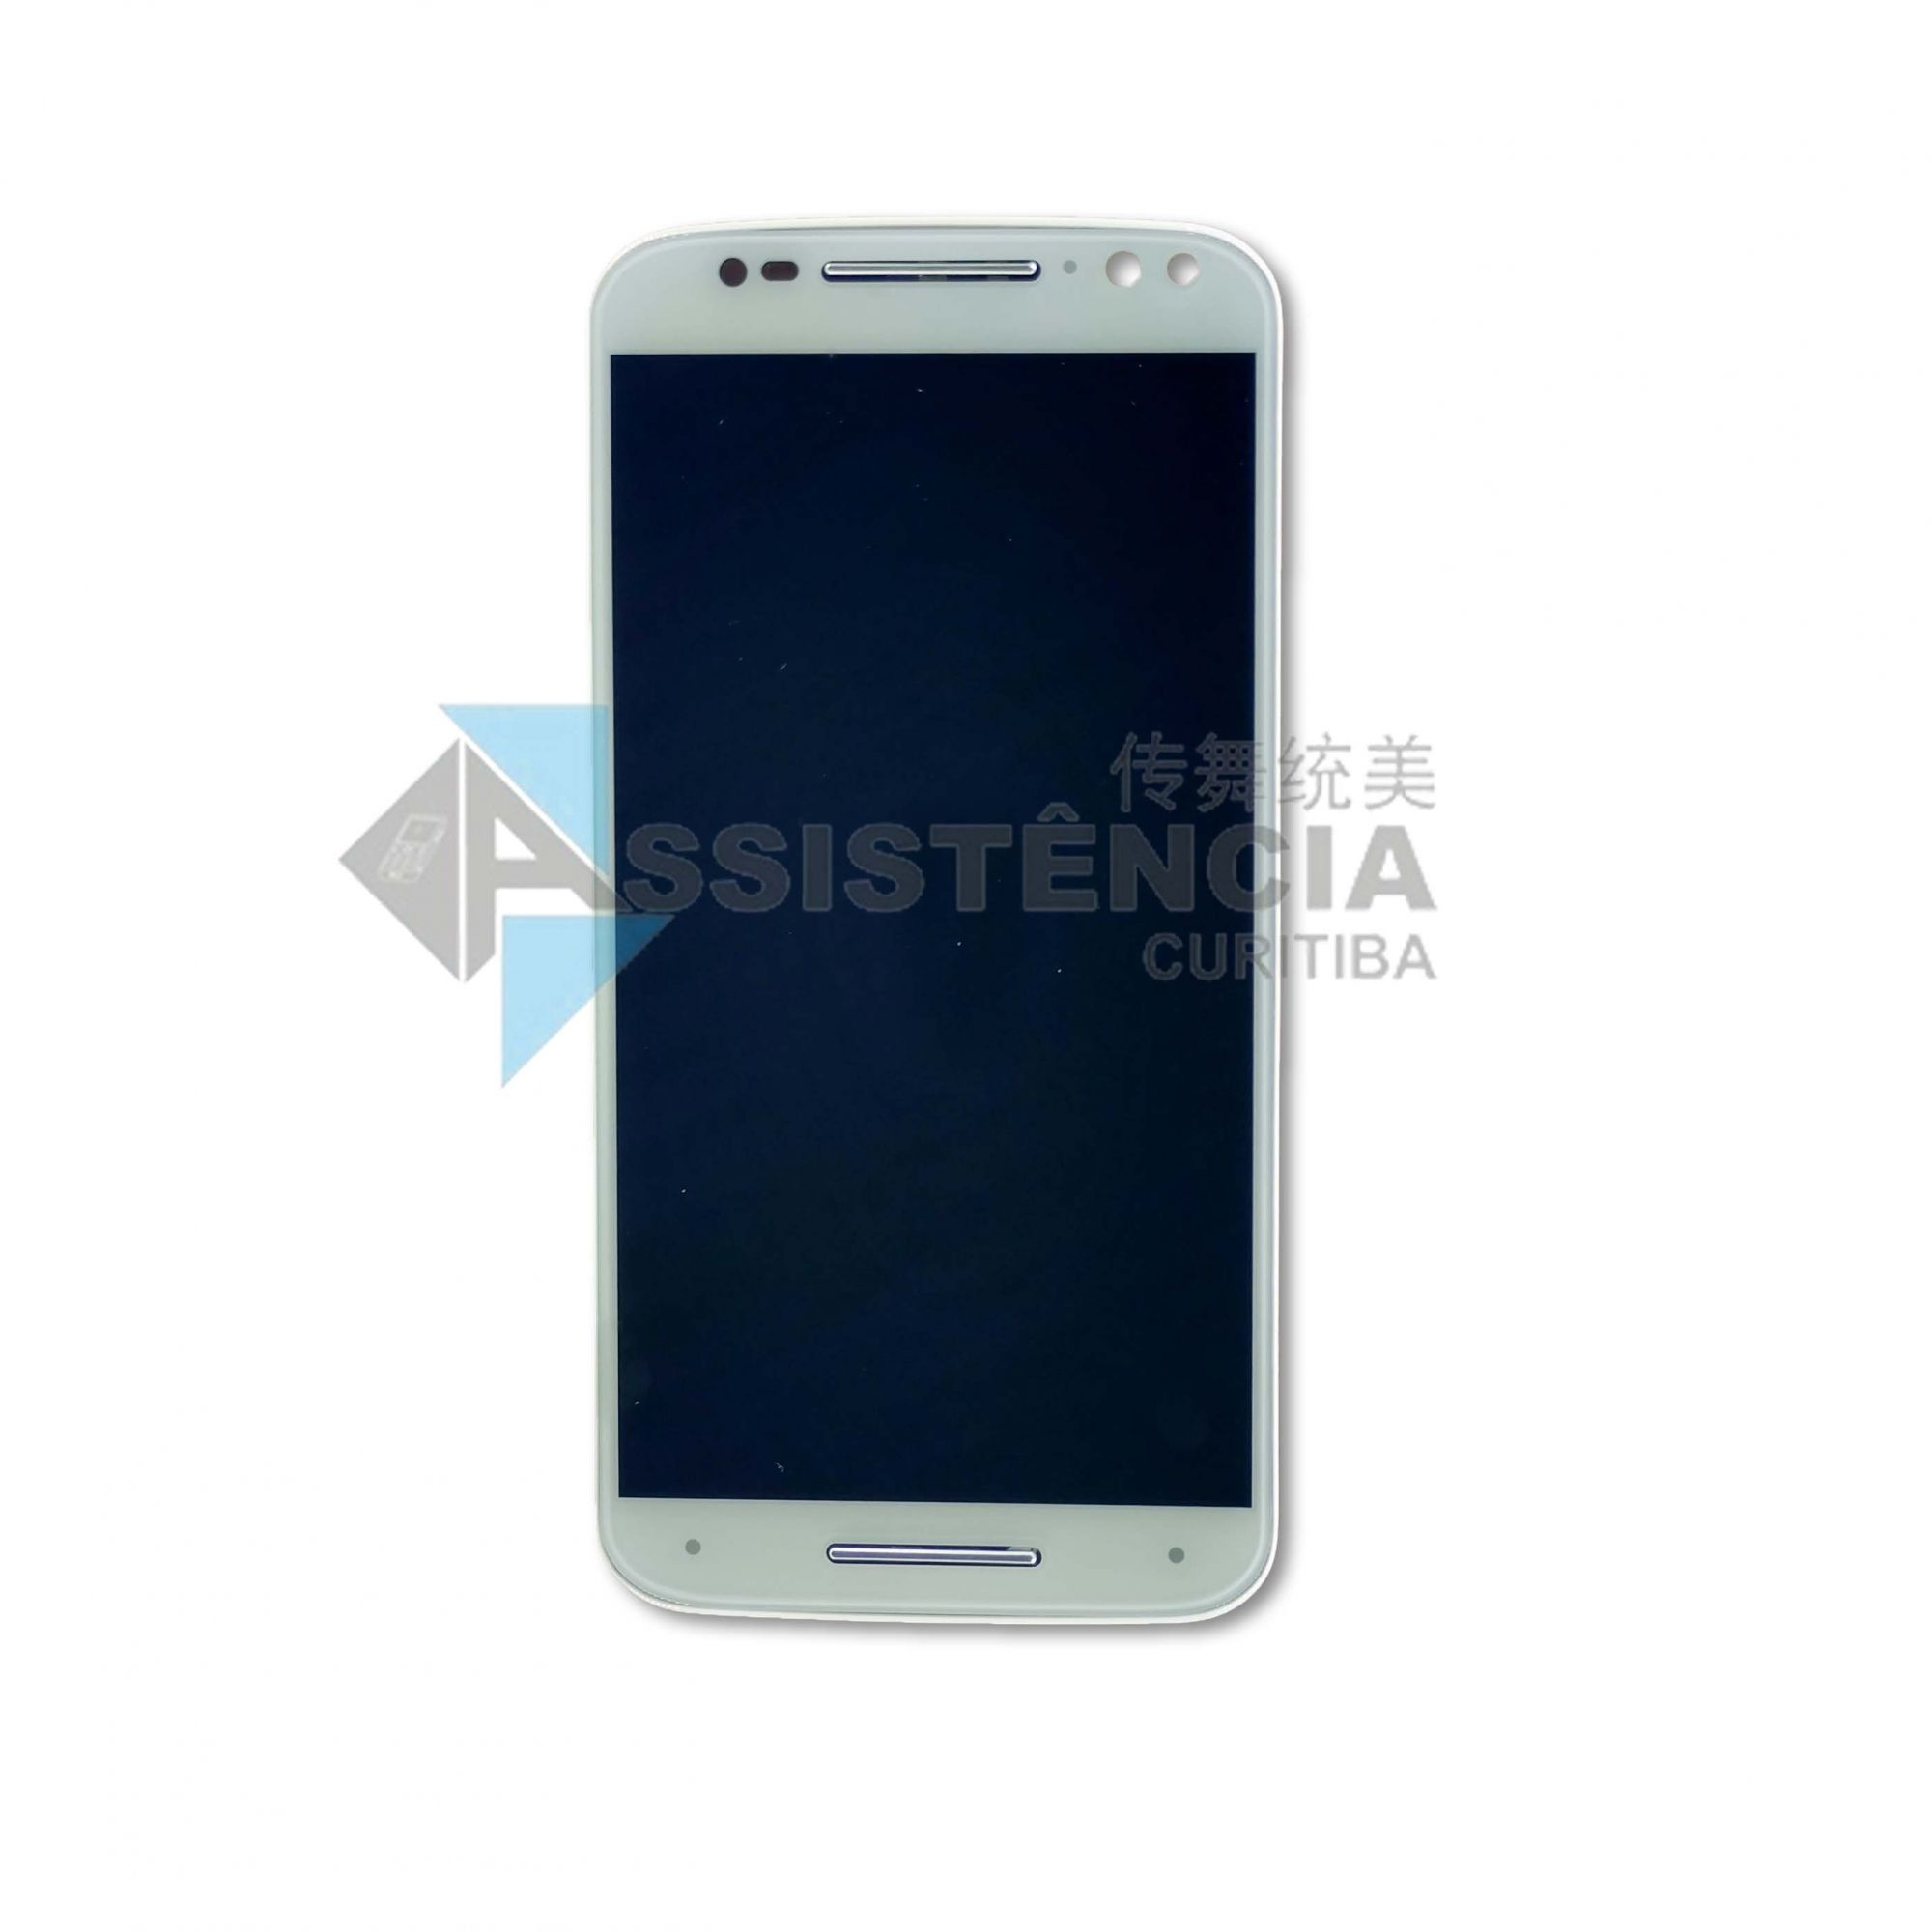 Tela Display Motorola Moto X Style Xt1570 Xt1572 Xt1575 Com Aro Branco